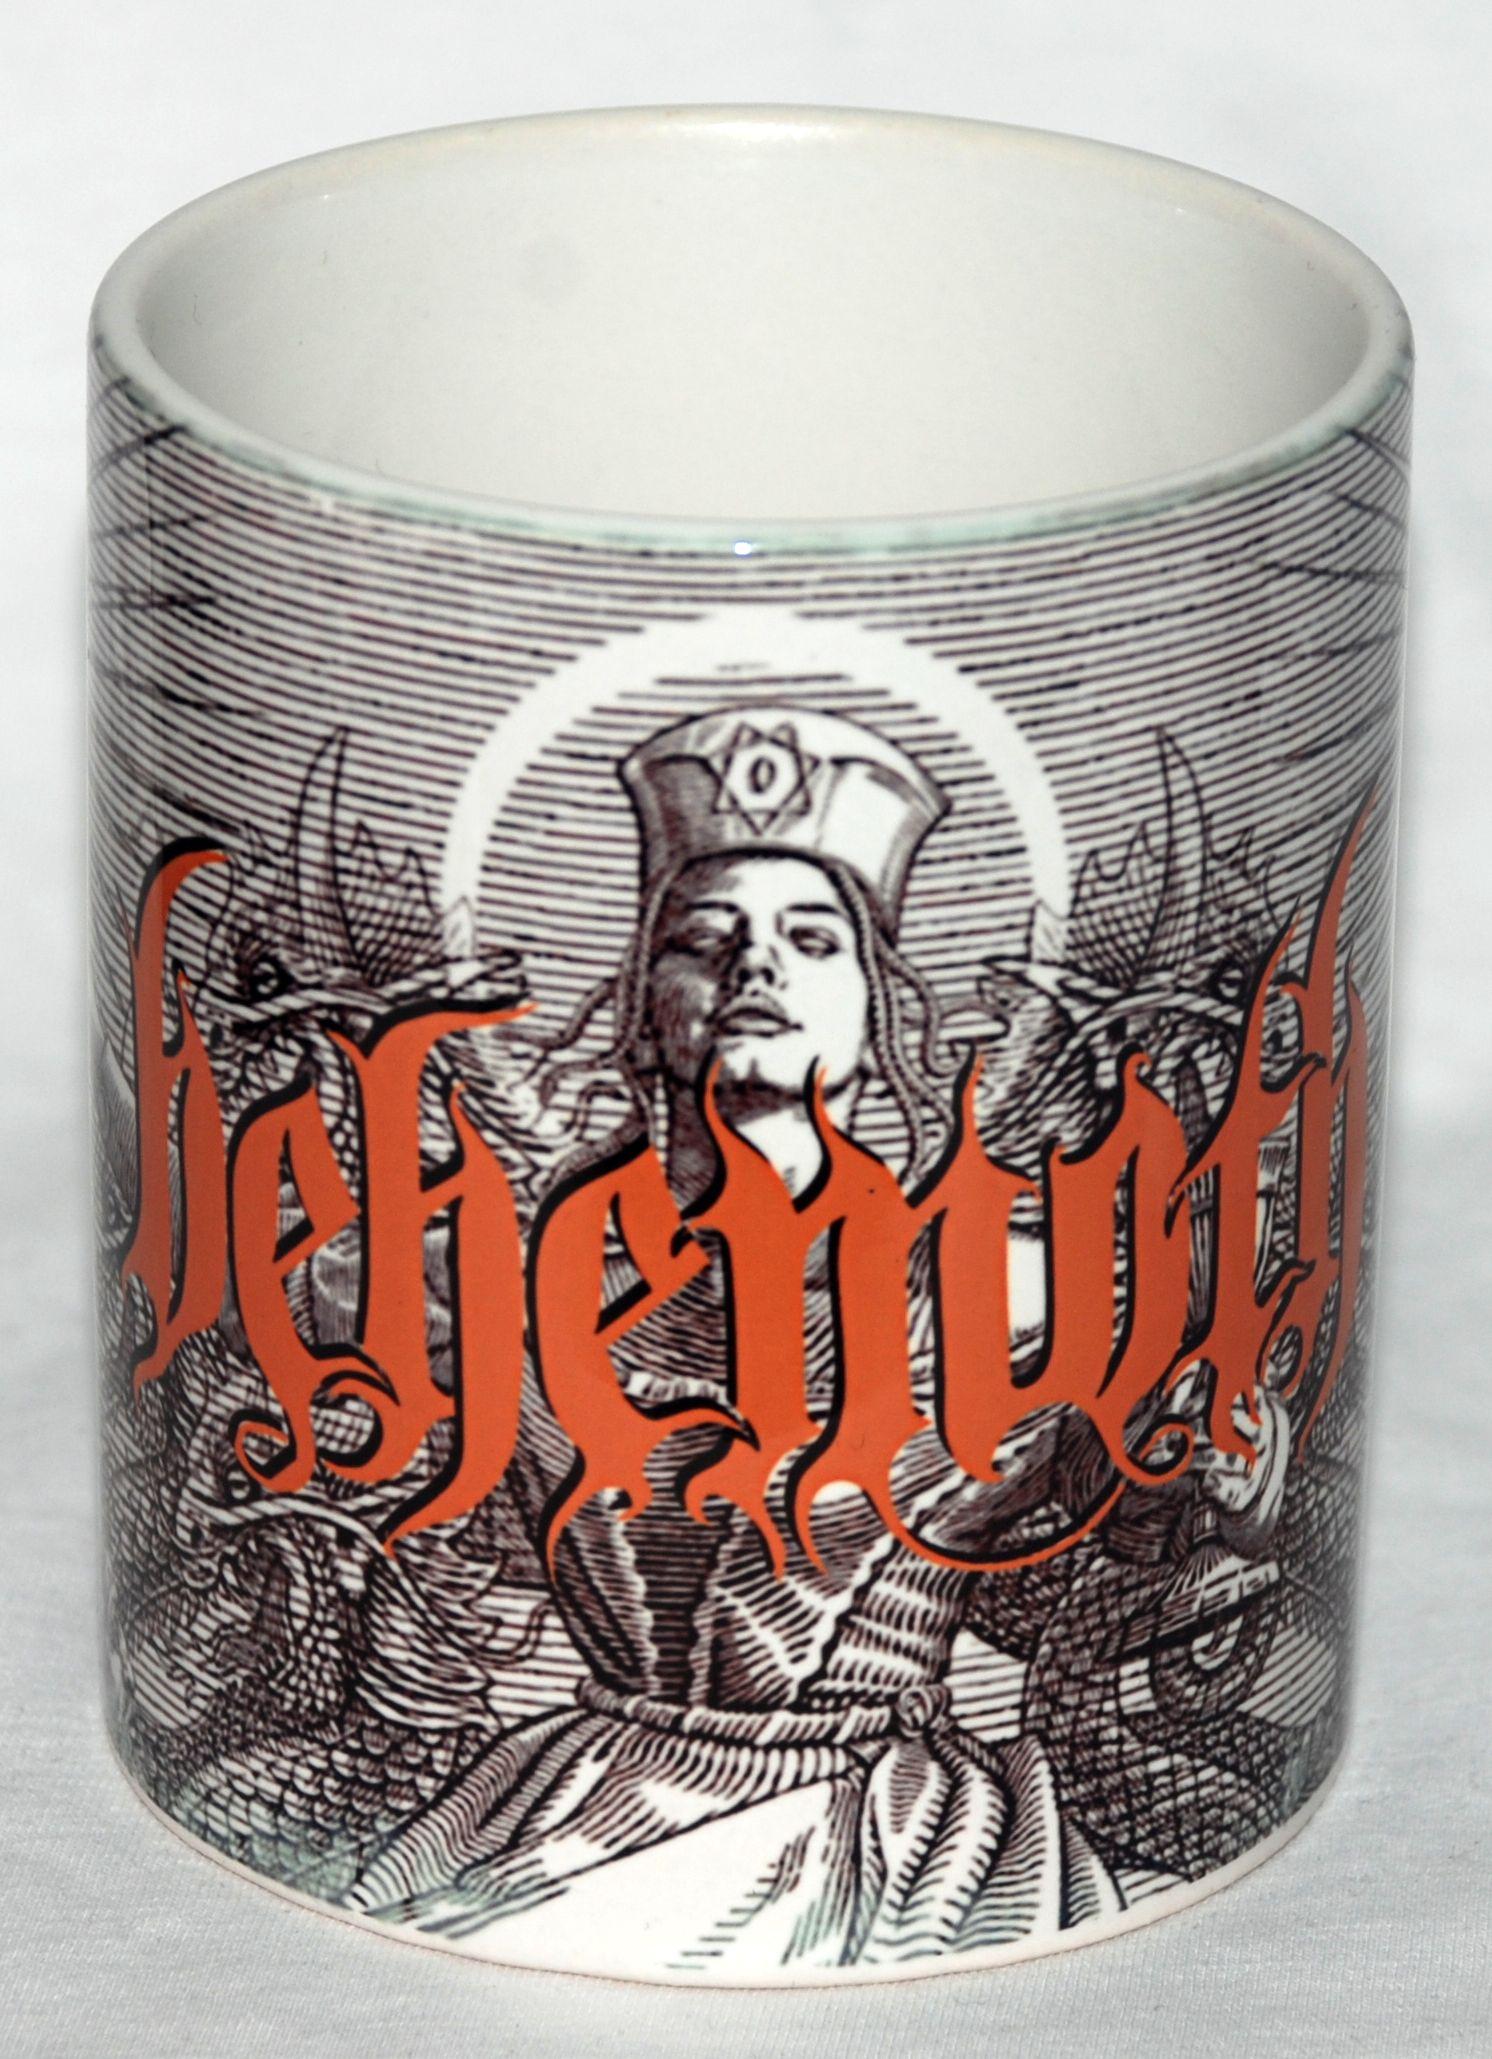 behemoth evangelion coffee mug metal rock t shirts and accessories. Black Bedroom Furniture Sets. Home Design Ideas